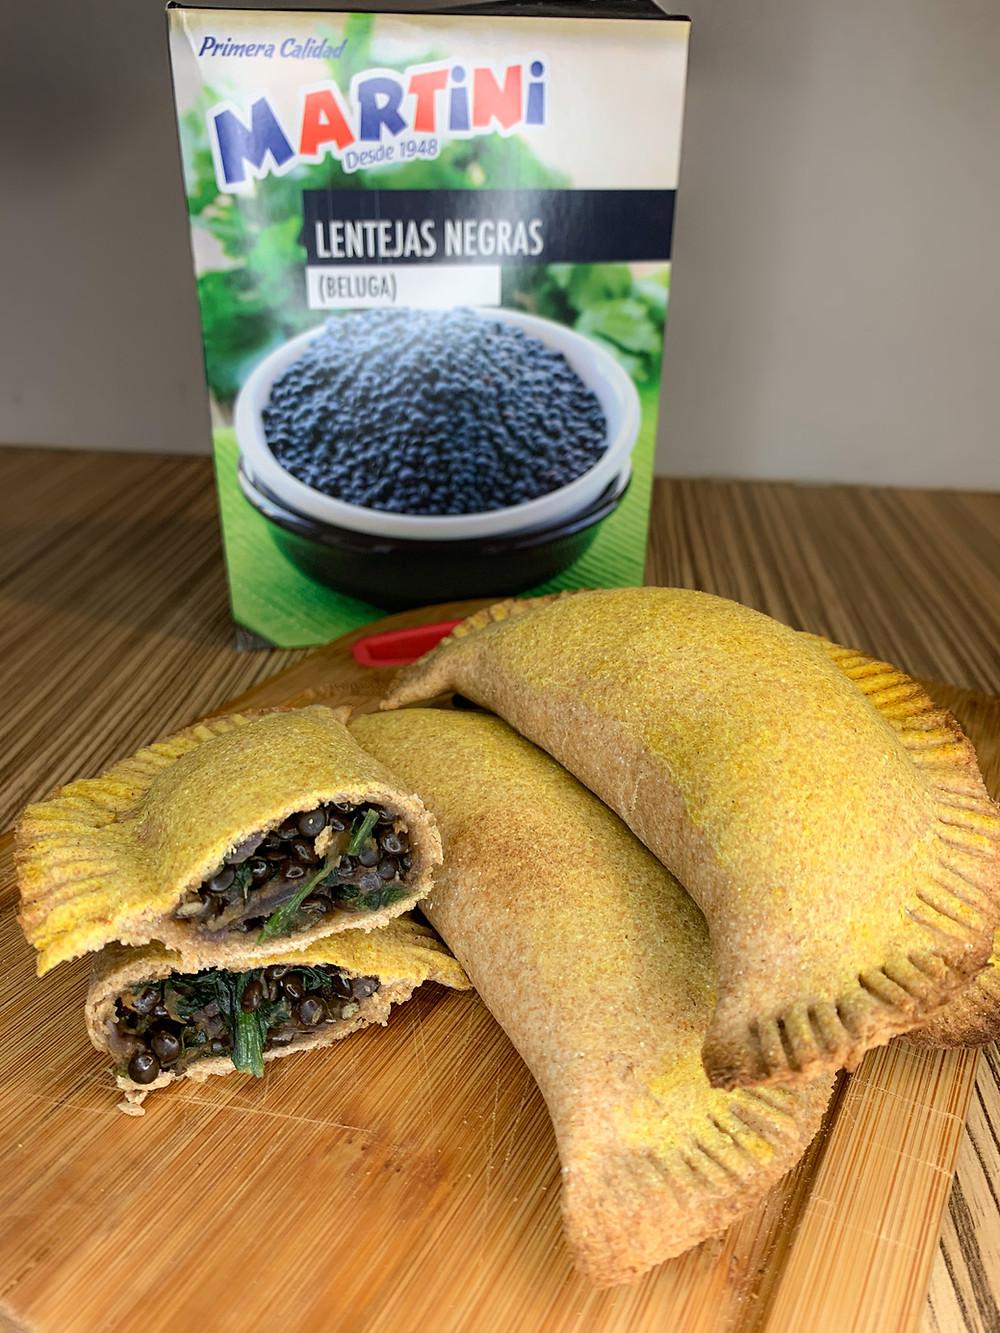 Empanadas integrales de lentejas negras Martini - Nutricionista Online Karina Herrera